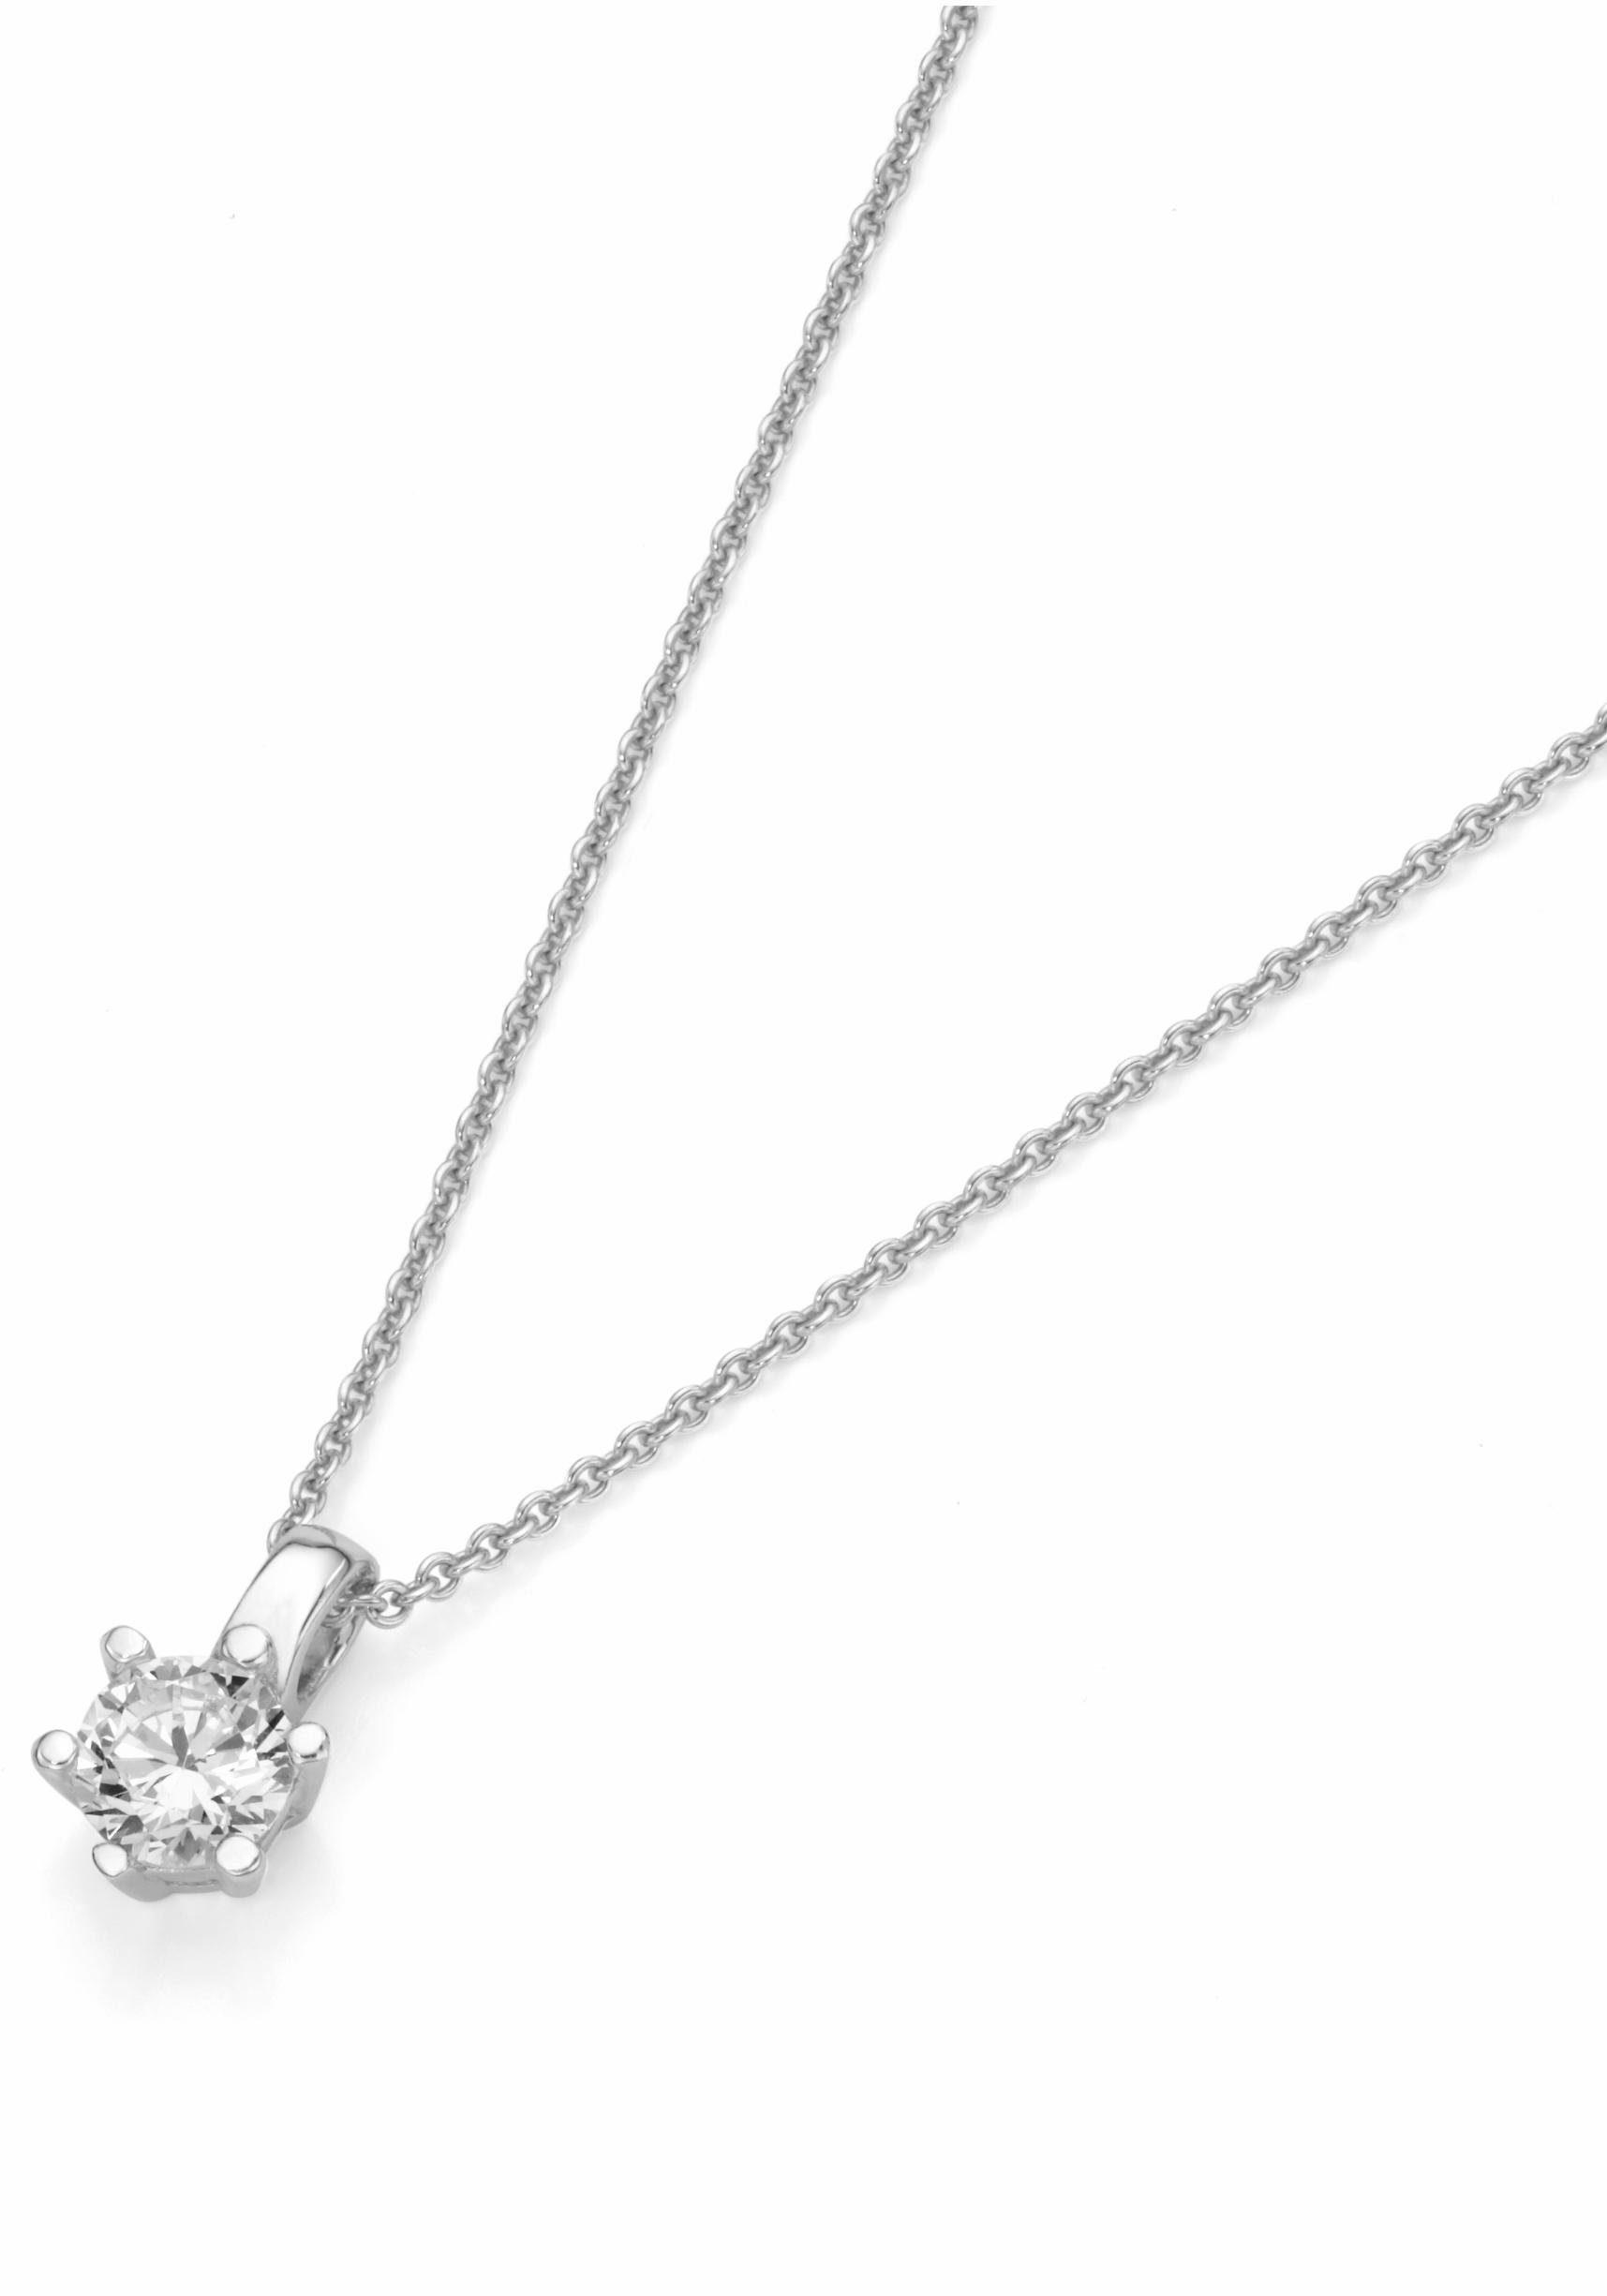 Firetti Silberkette »Solitär«, mit Zirkonia